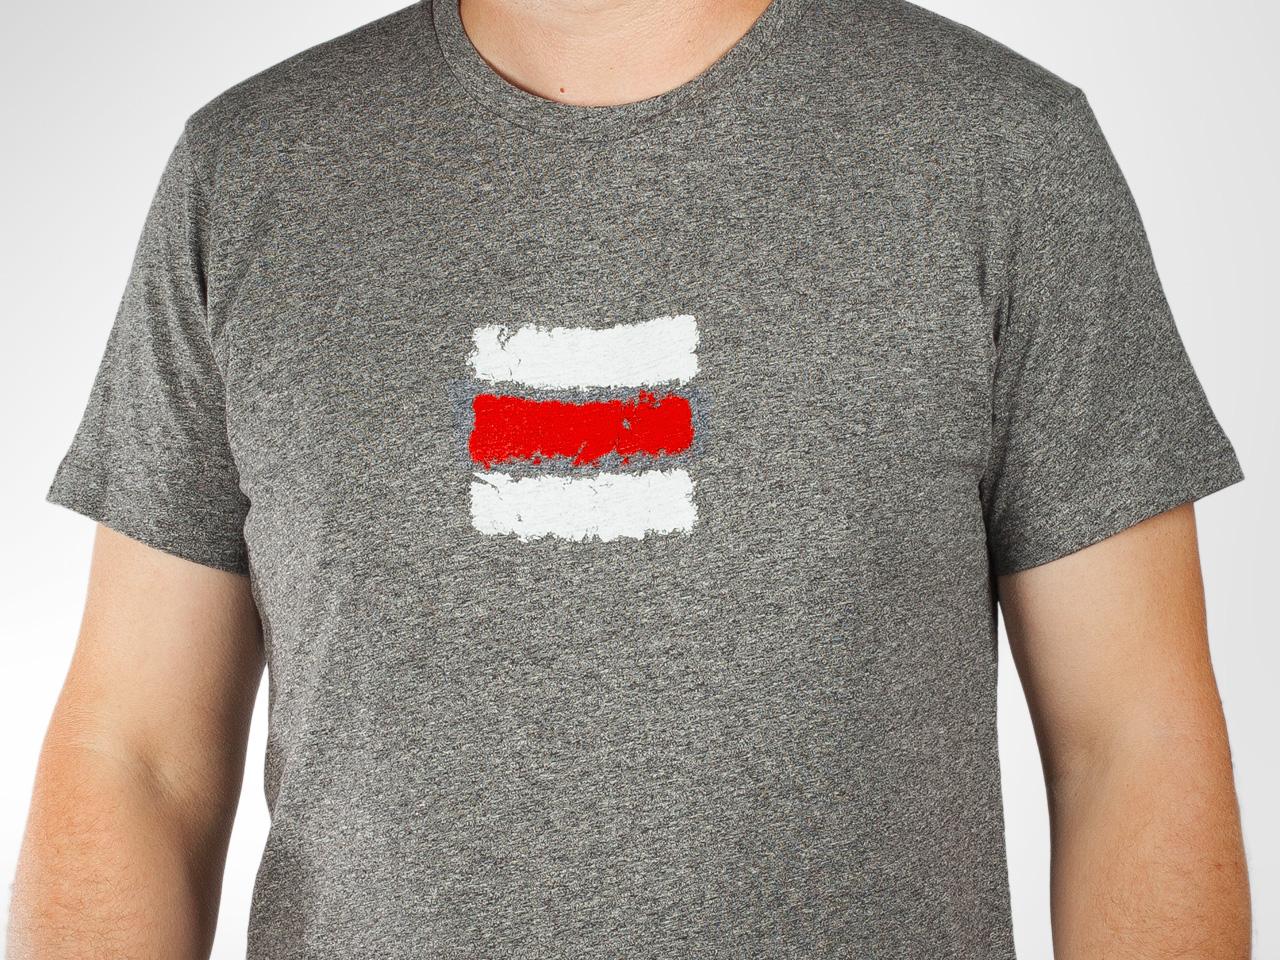 Turistické tričko Červená značka — Kompot aea6c332d4